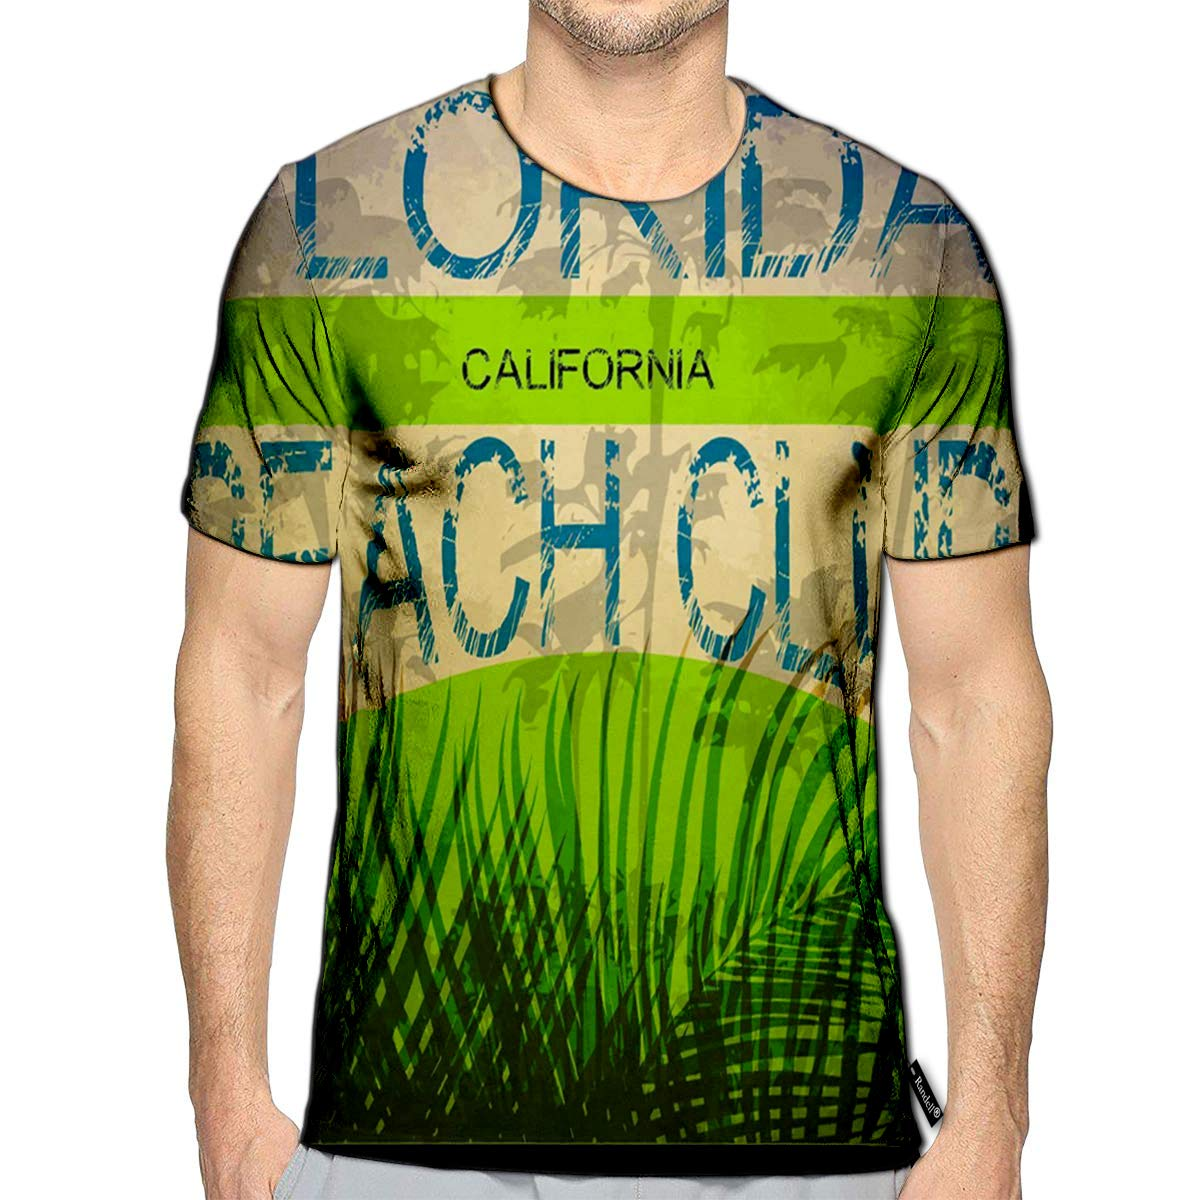 Randell 3D Printed T-Shirts Material Stardust Polka Glitter Light Bright Glitteringheave